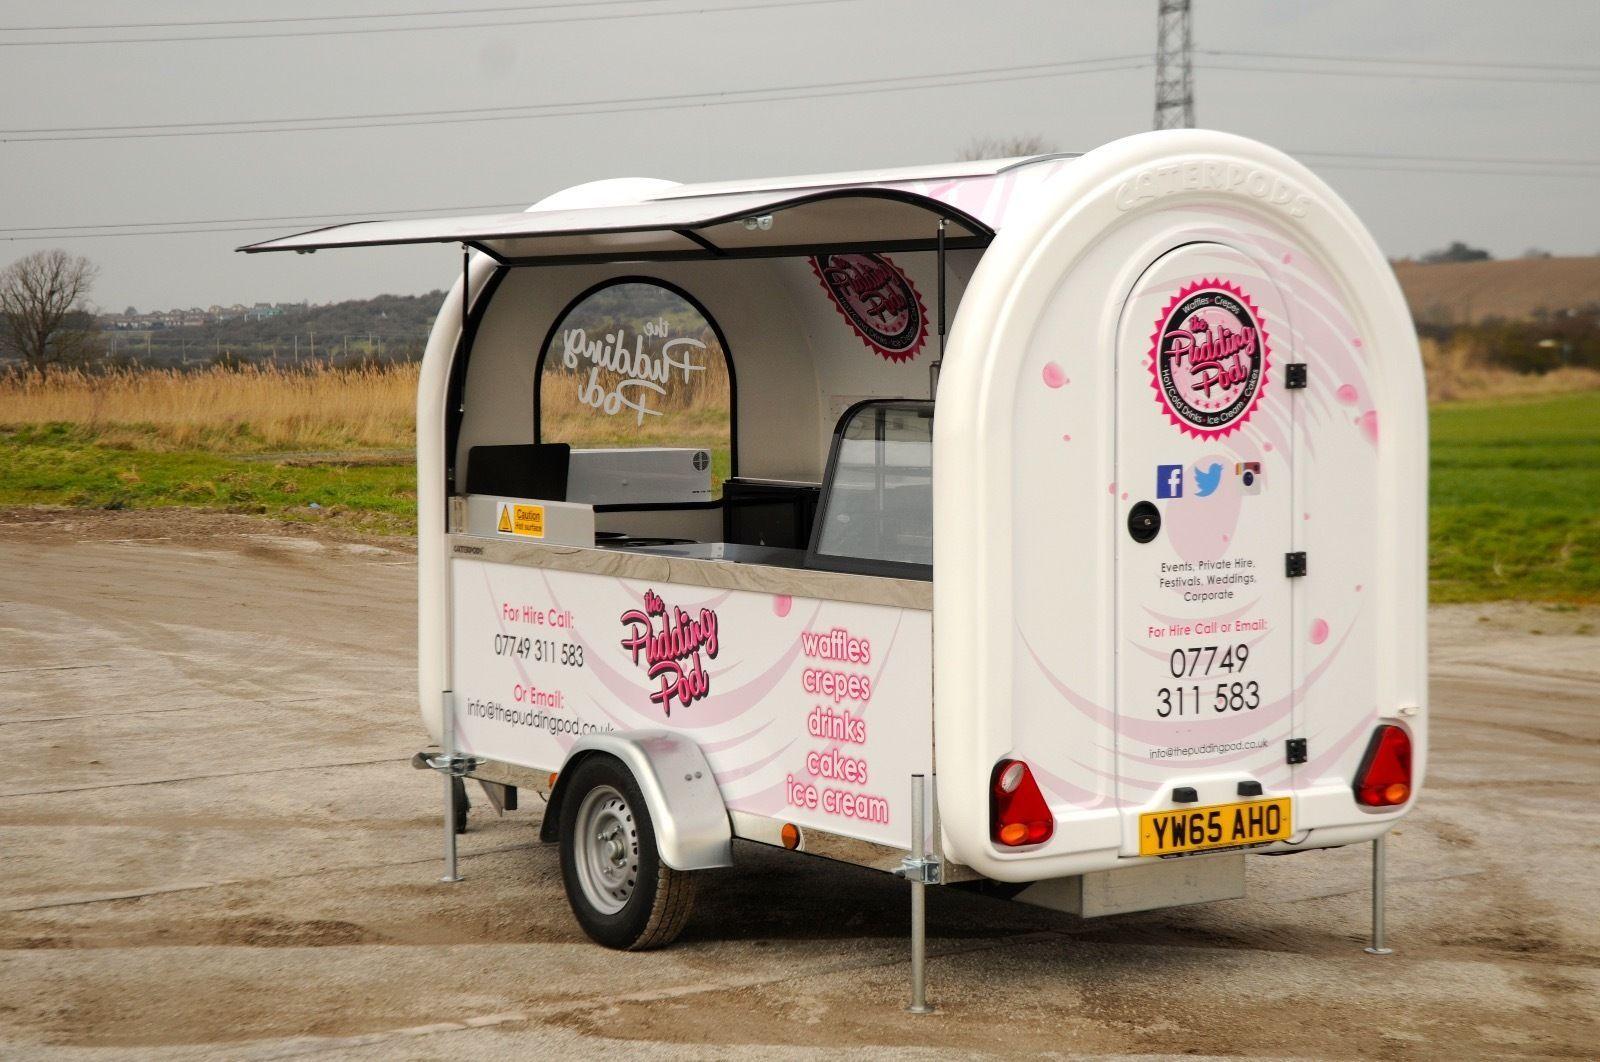 Mobile catering trailer  Doughnut, Waffle & Ice Cream Van